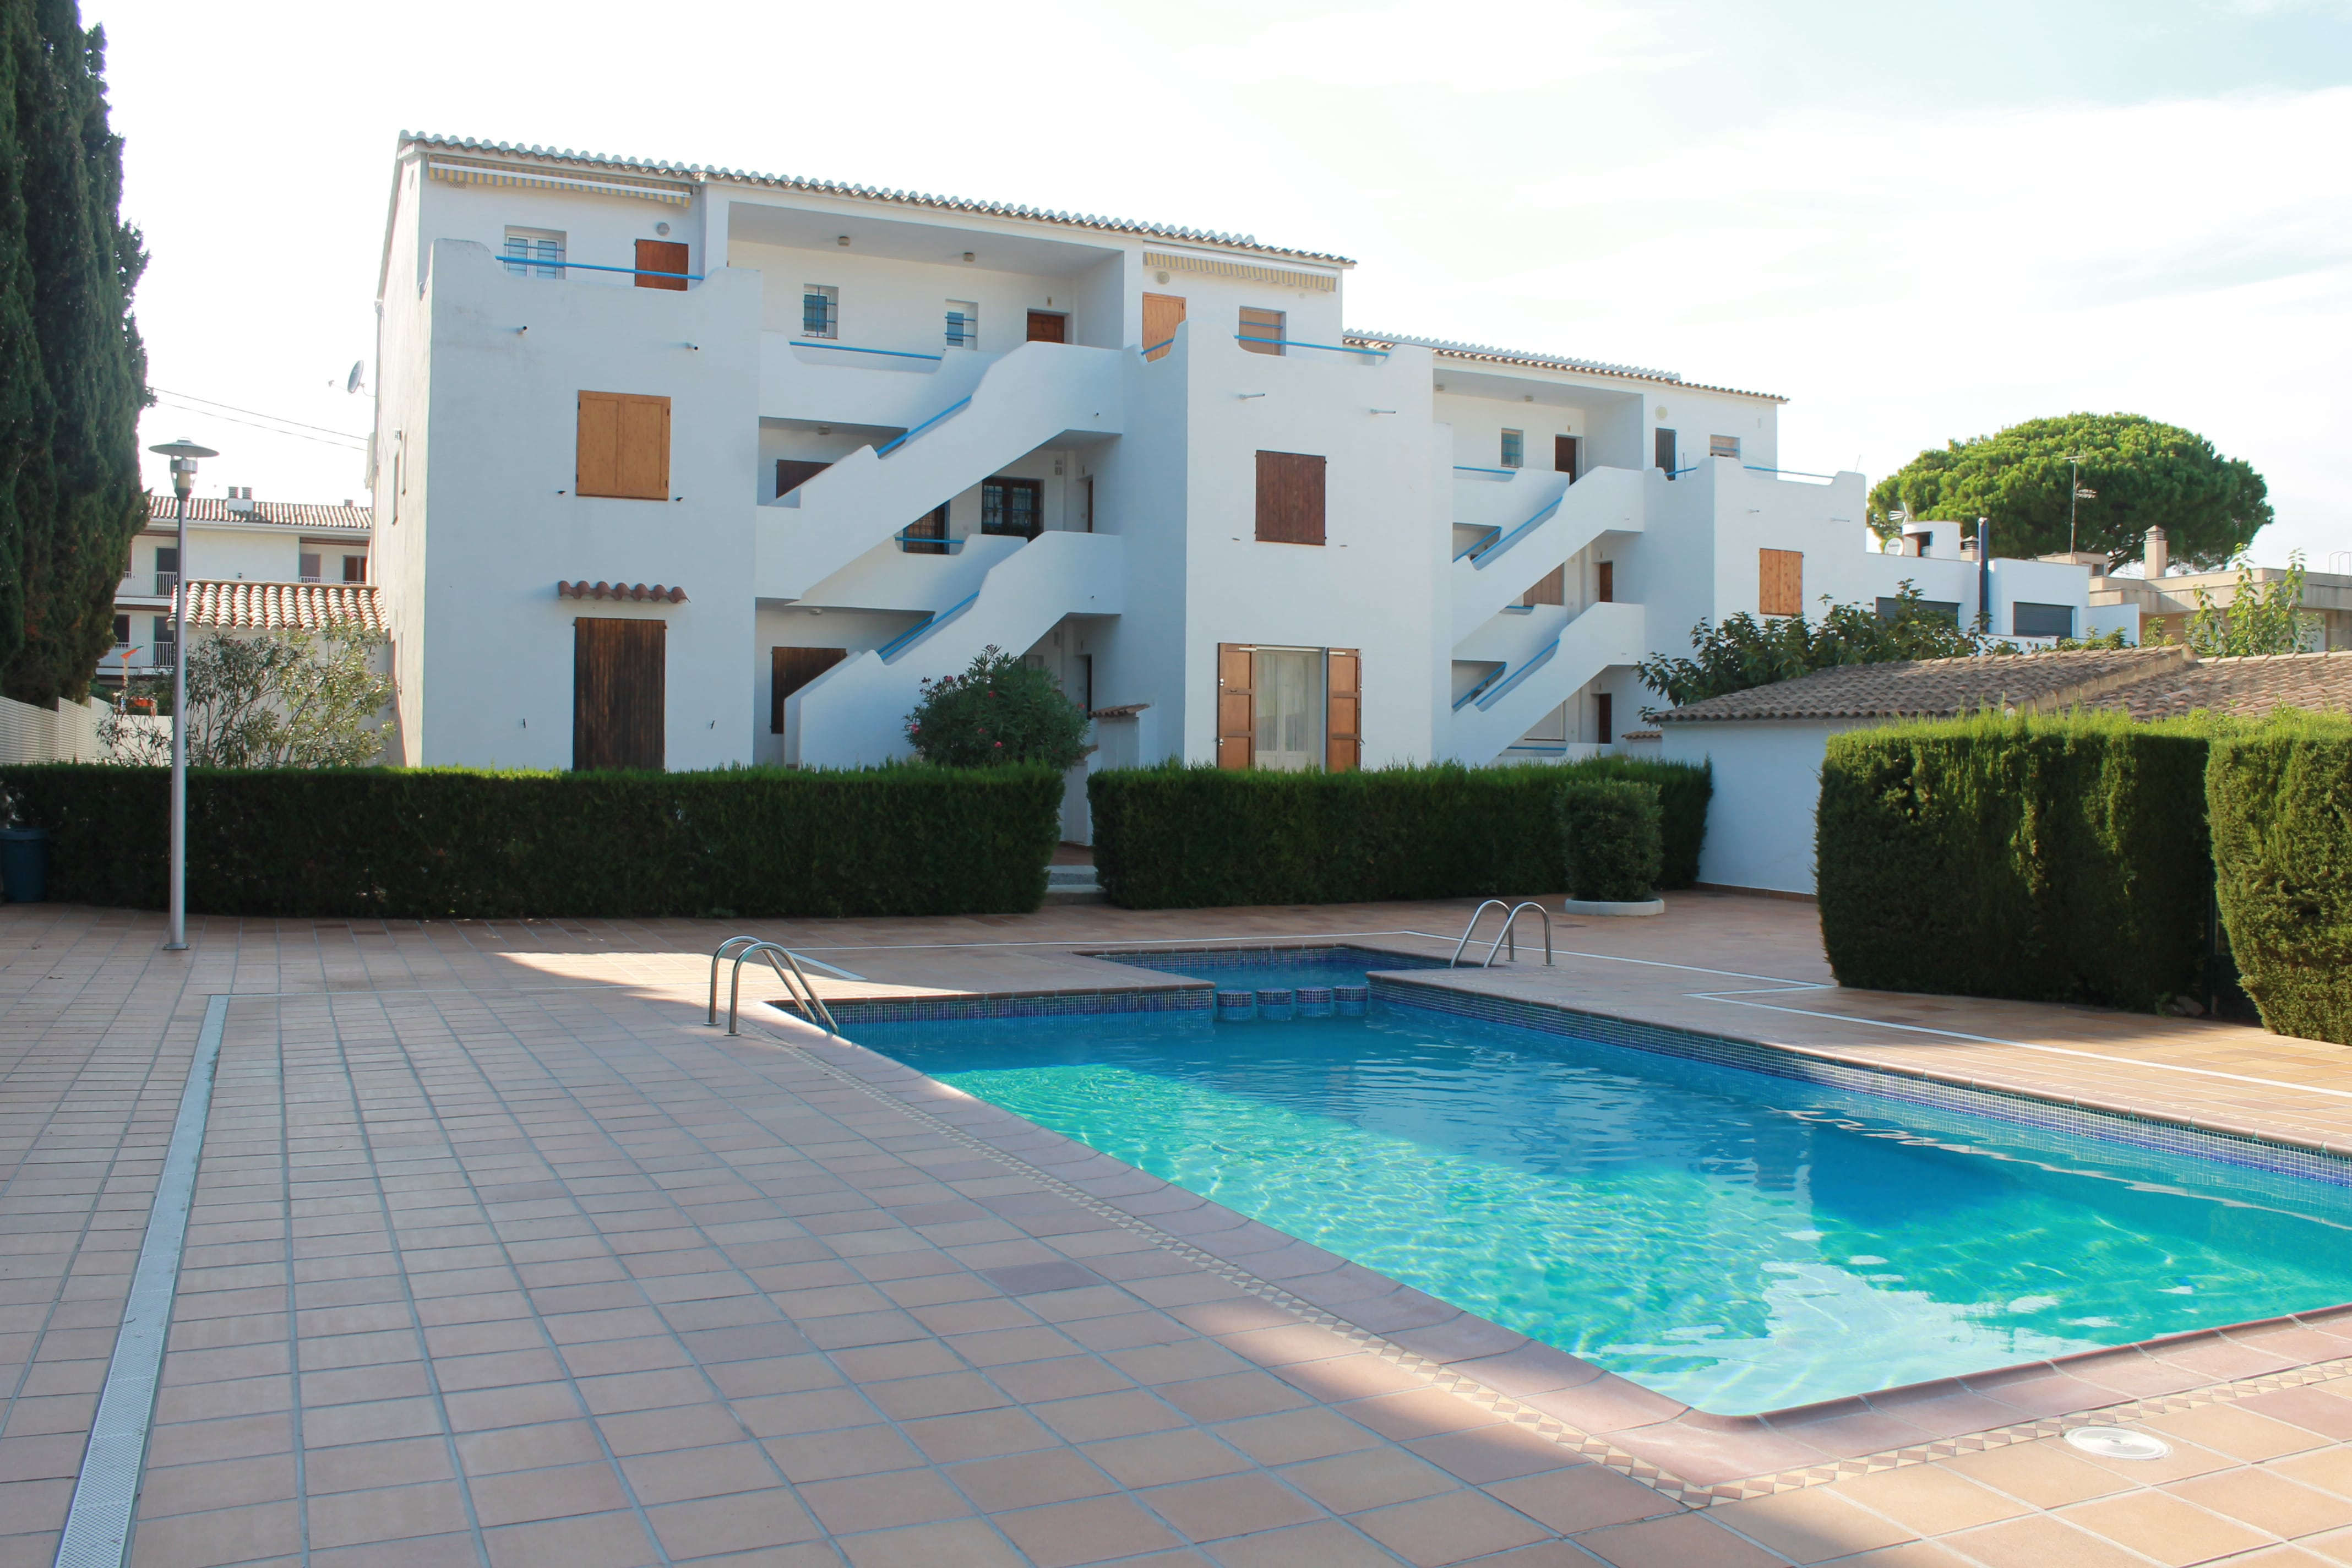 Appartements avec piscine communautaire